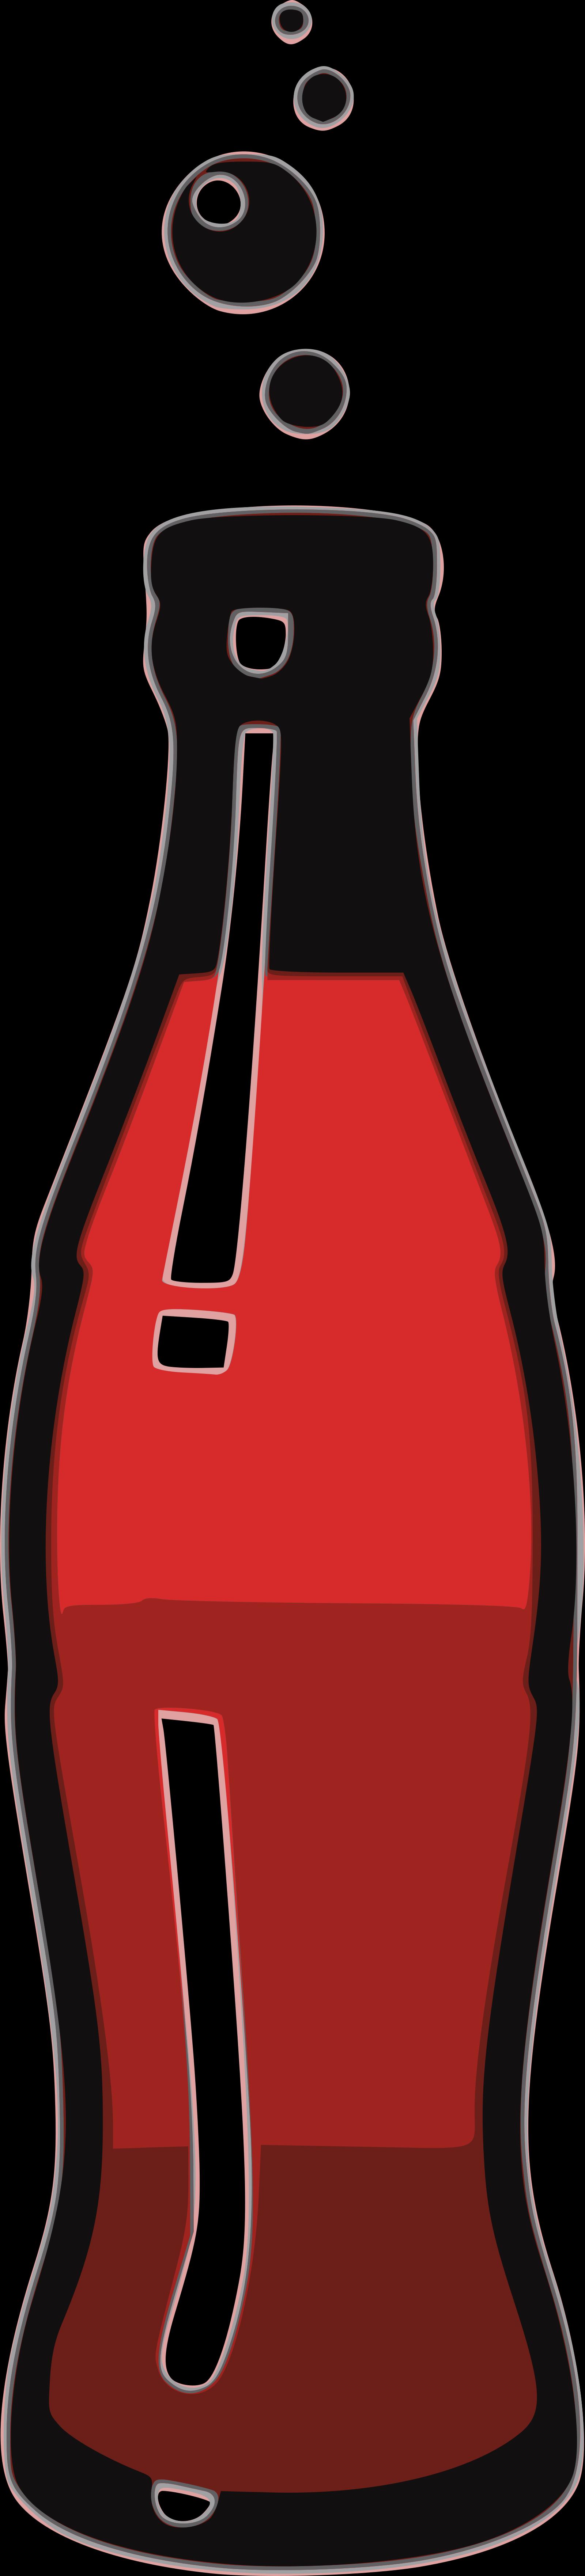 Bottle SVG Clip arts